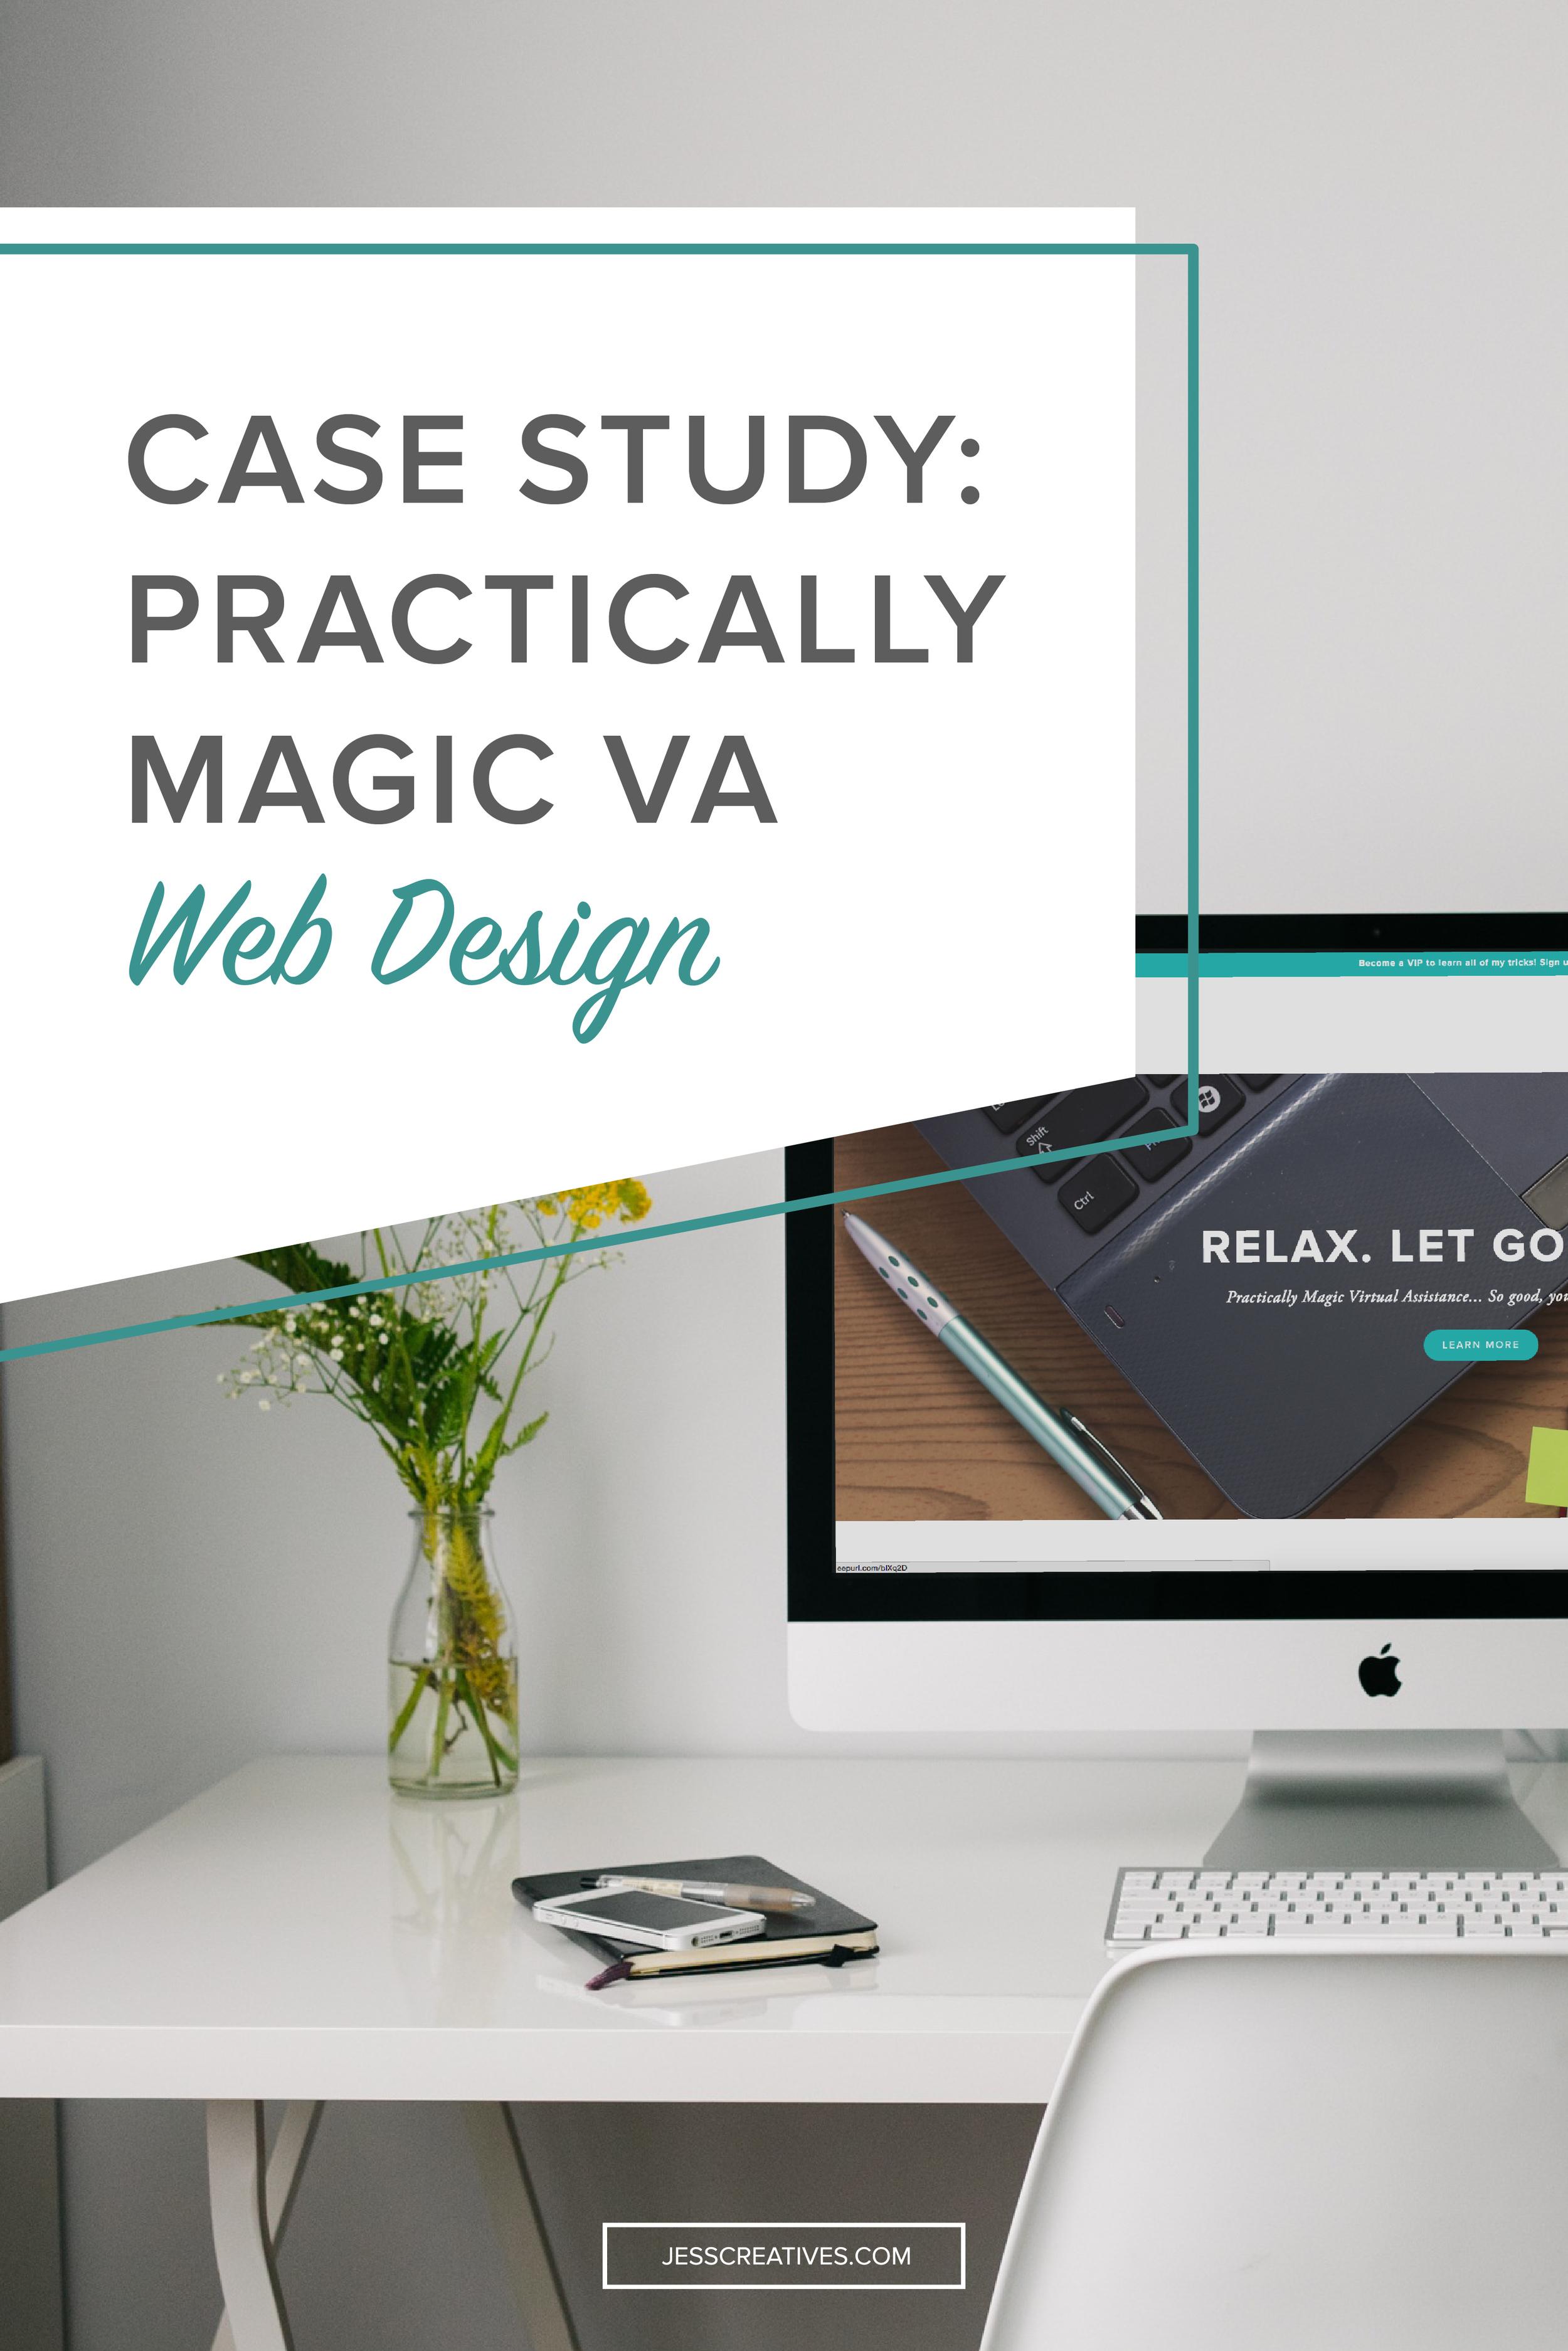 Case study: Practically Magic VA website